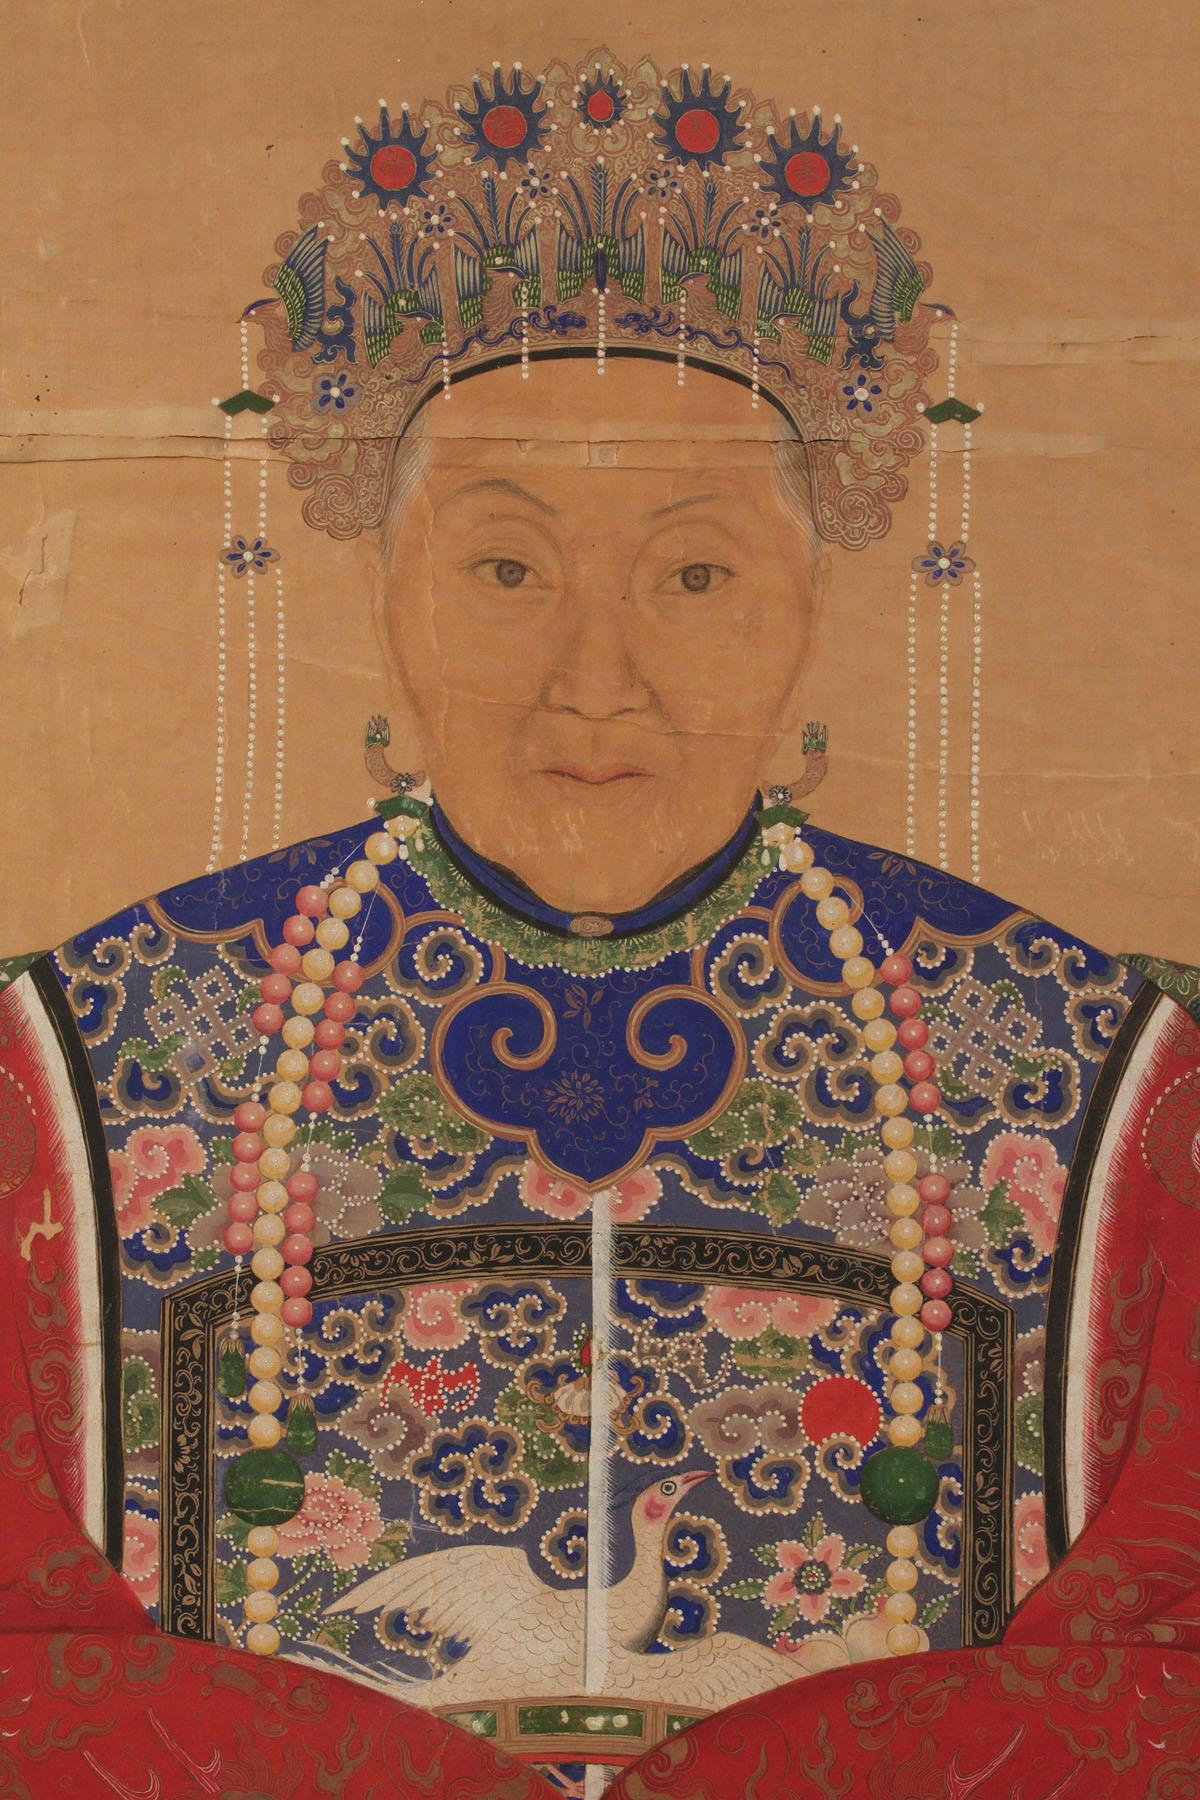 Lot 418 Chinese Ancestor Portrait